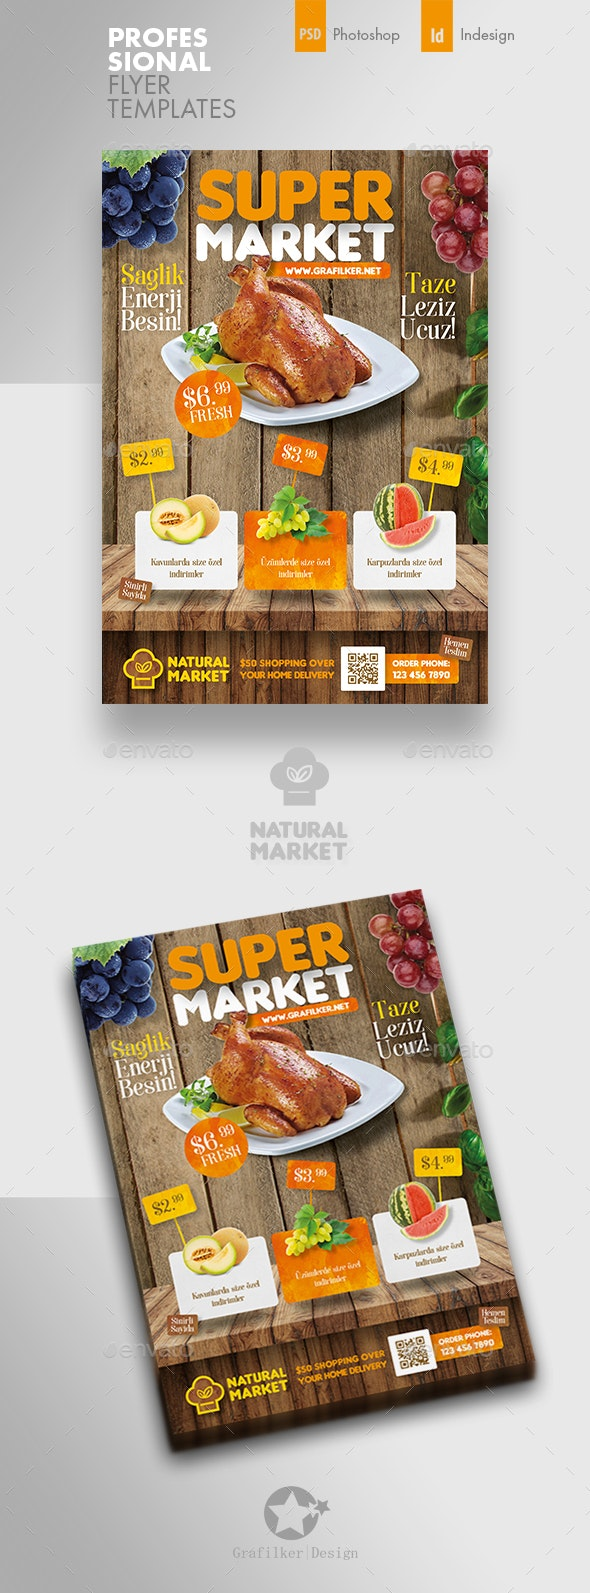 Supermarket Promotion Flyer Templates - Corporate Flyers